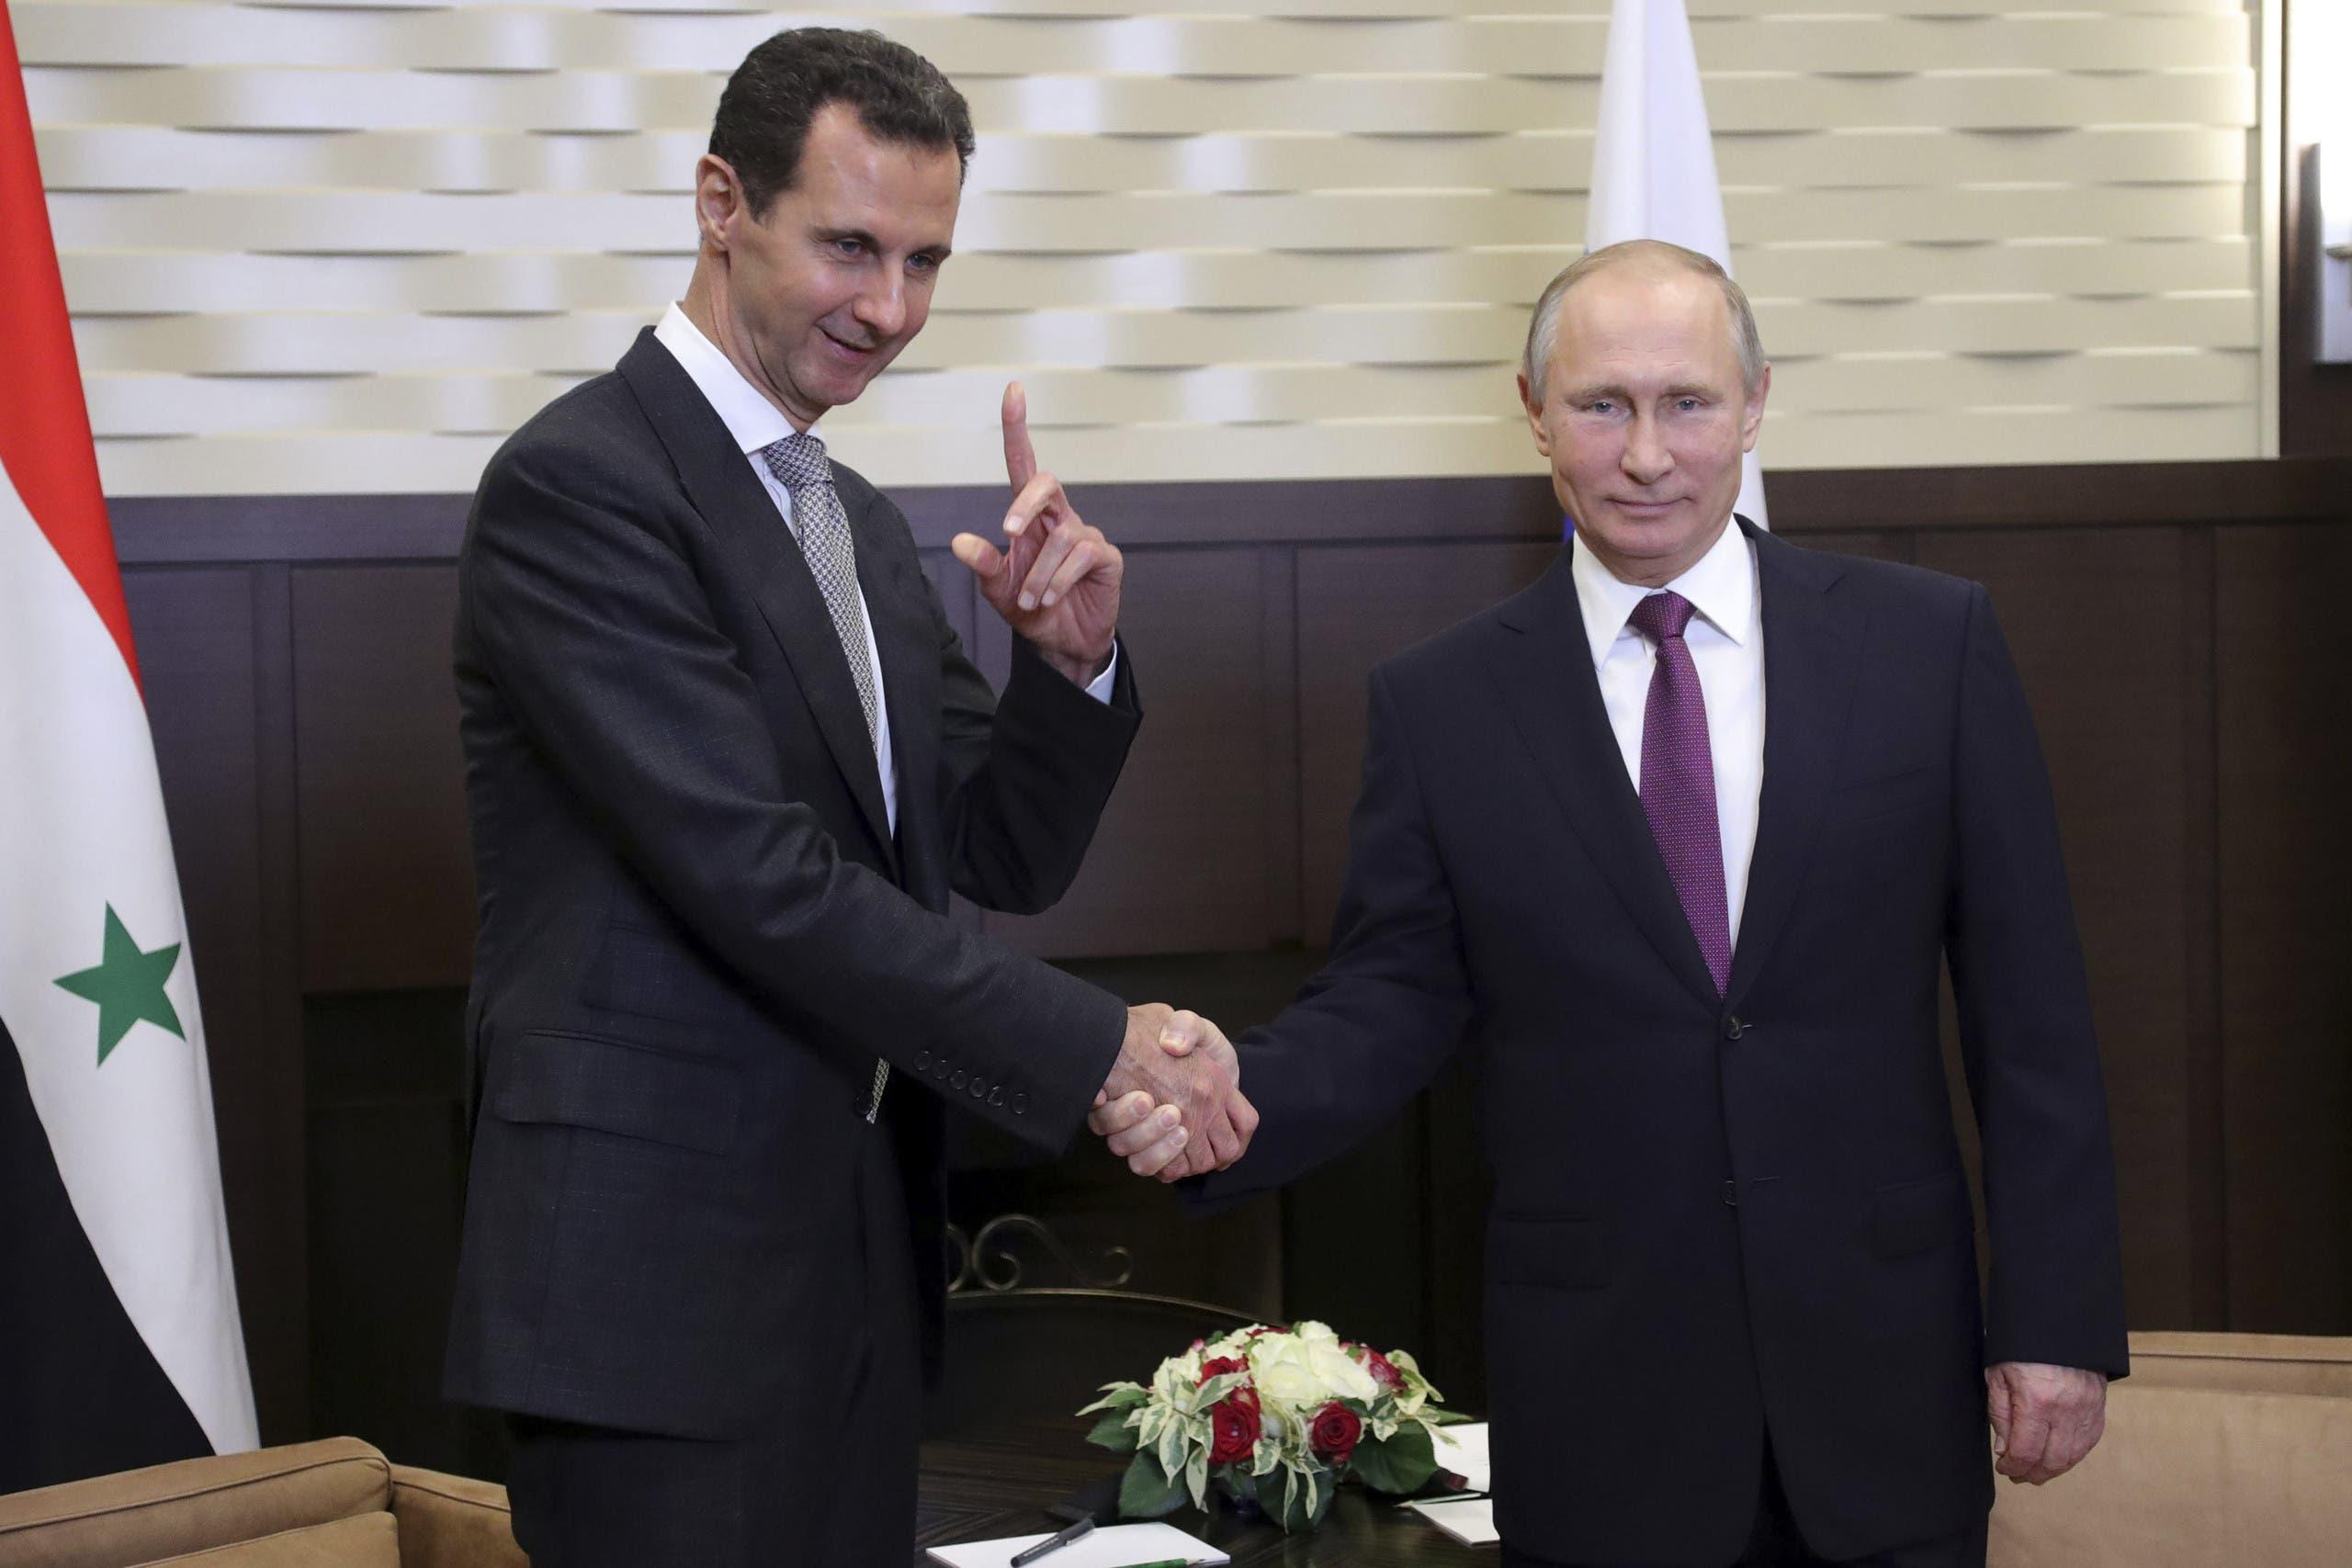 Putin with Bashar al-Assad in the Black Sea resort of Sochi, Russia, on November 20, 2017. (Reuters)